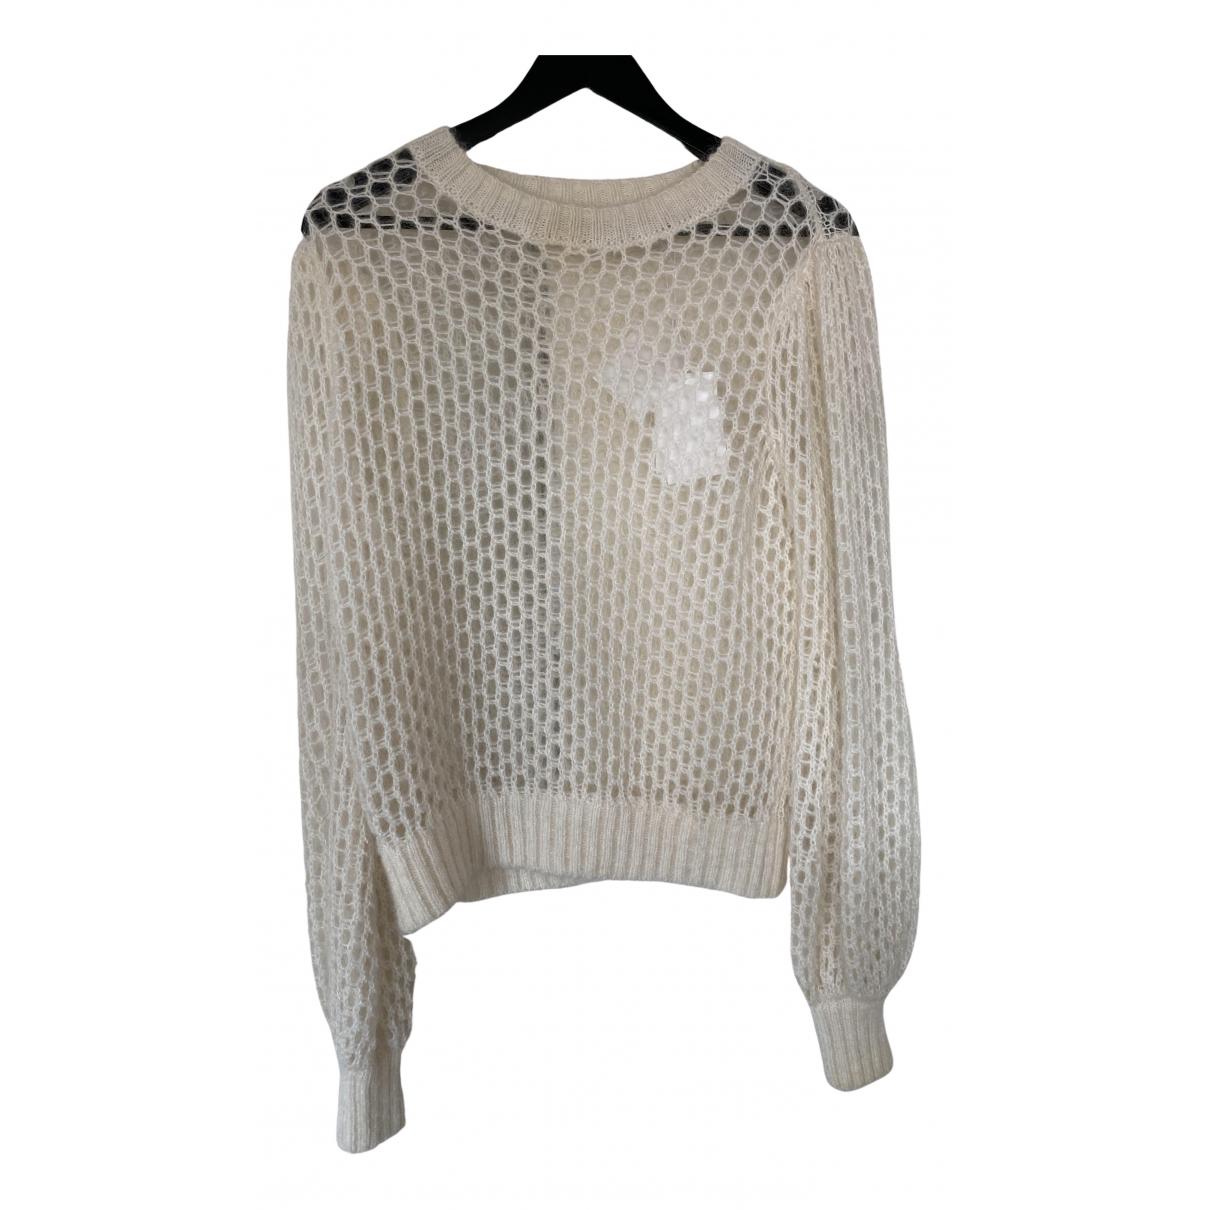 Zimmermann - Pull   pour femme en laine - beige